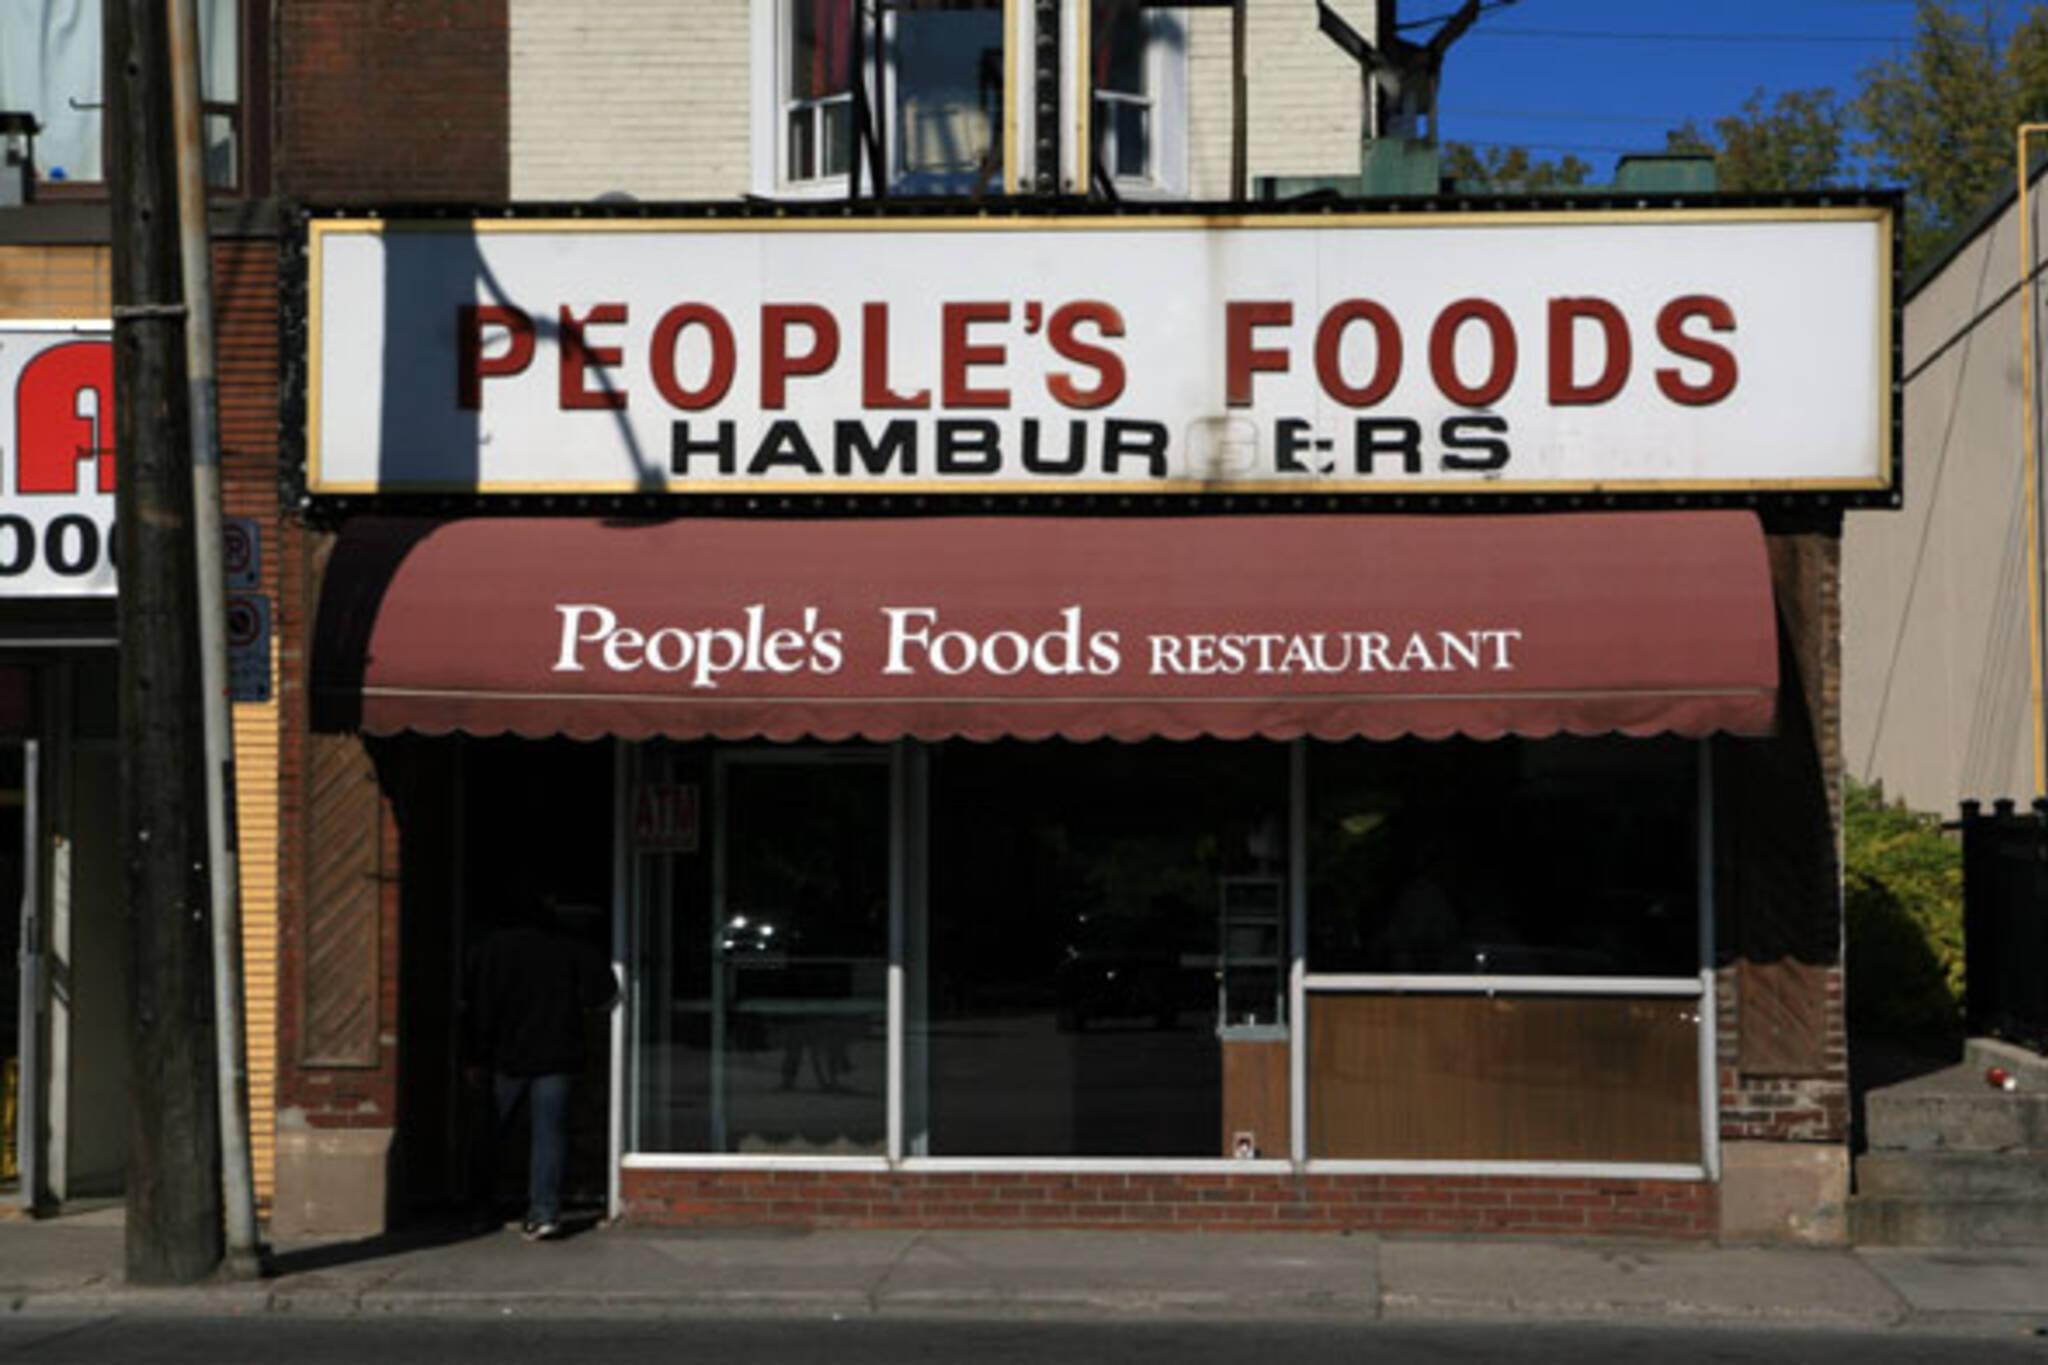 People's Foods